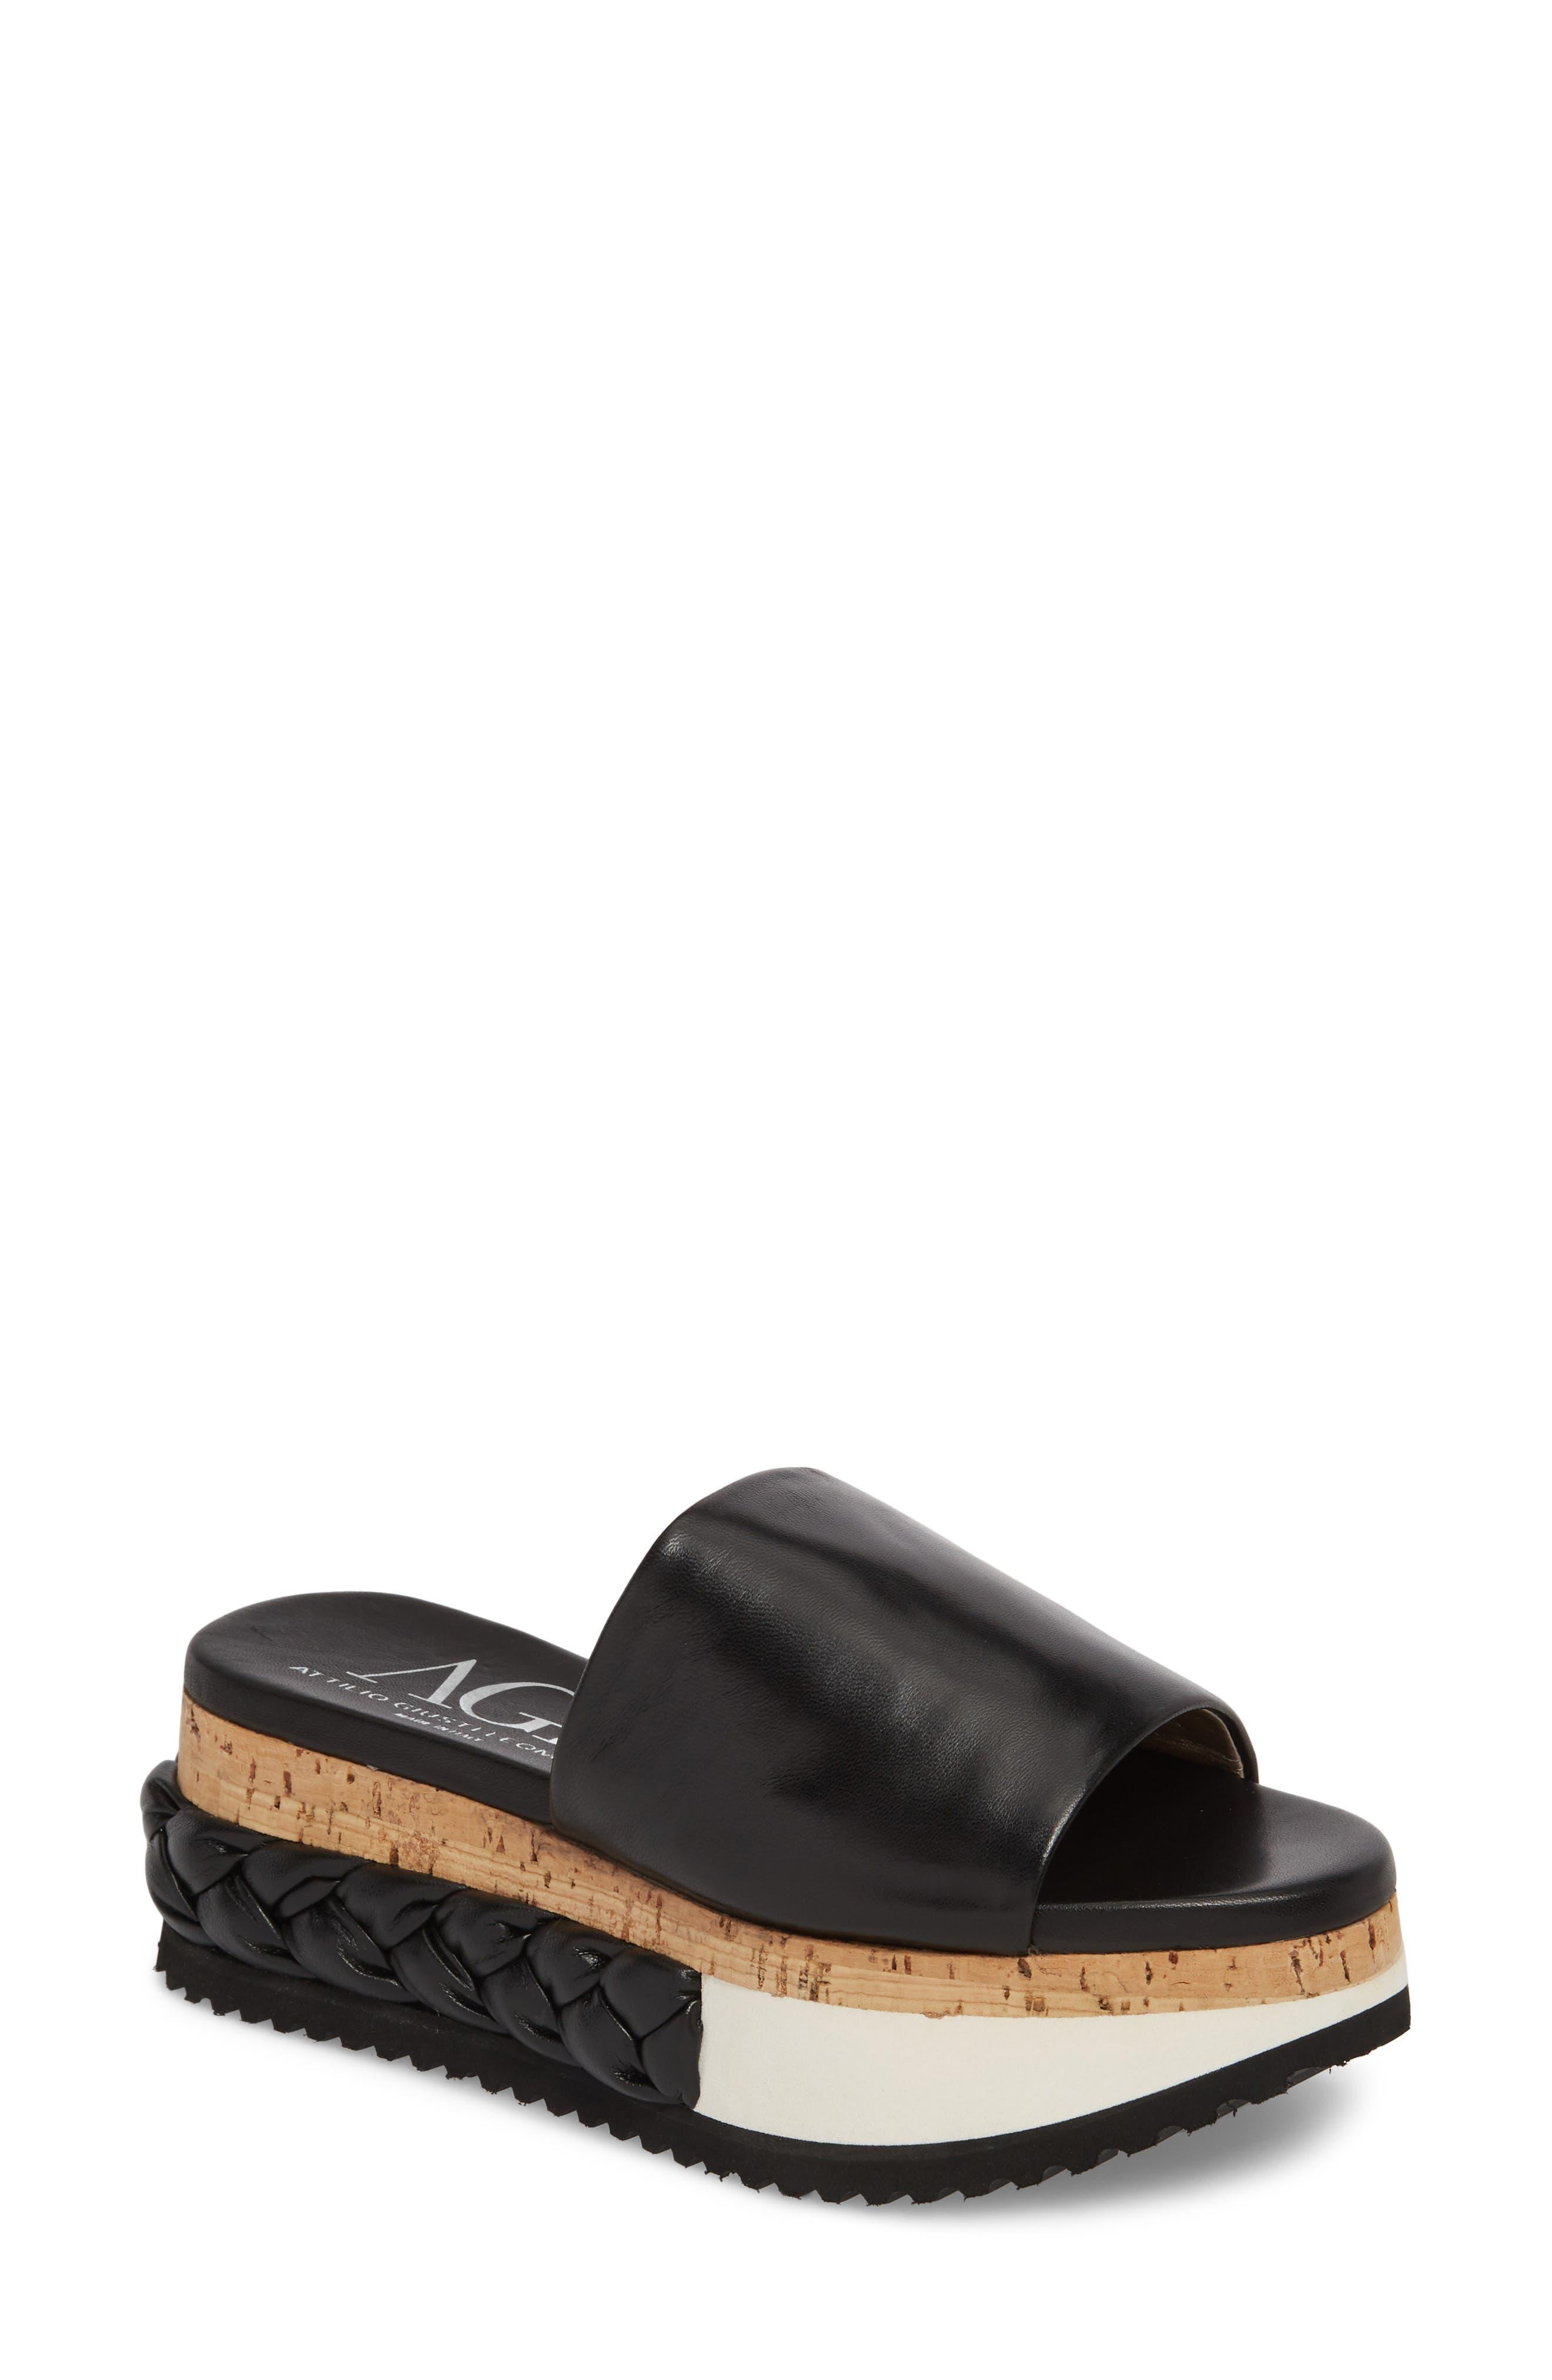 AGL ATTILIO GIUSTI LEOMBRUNI Women's Studded Block Heel Slide Sandal